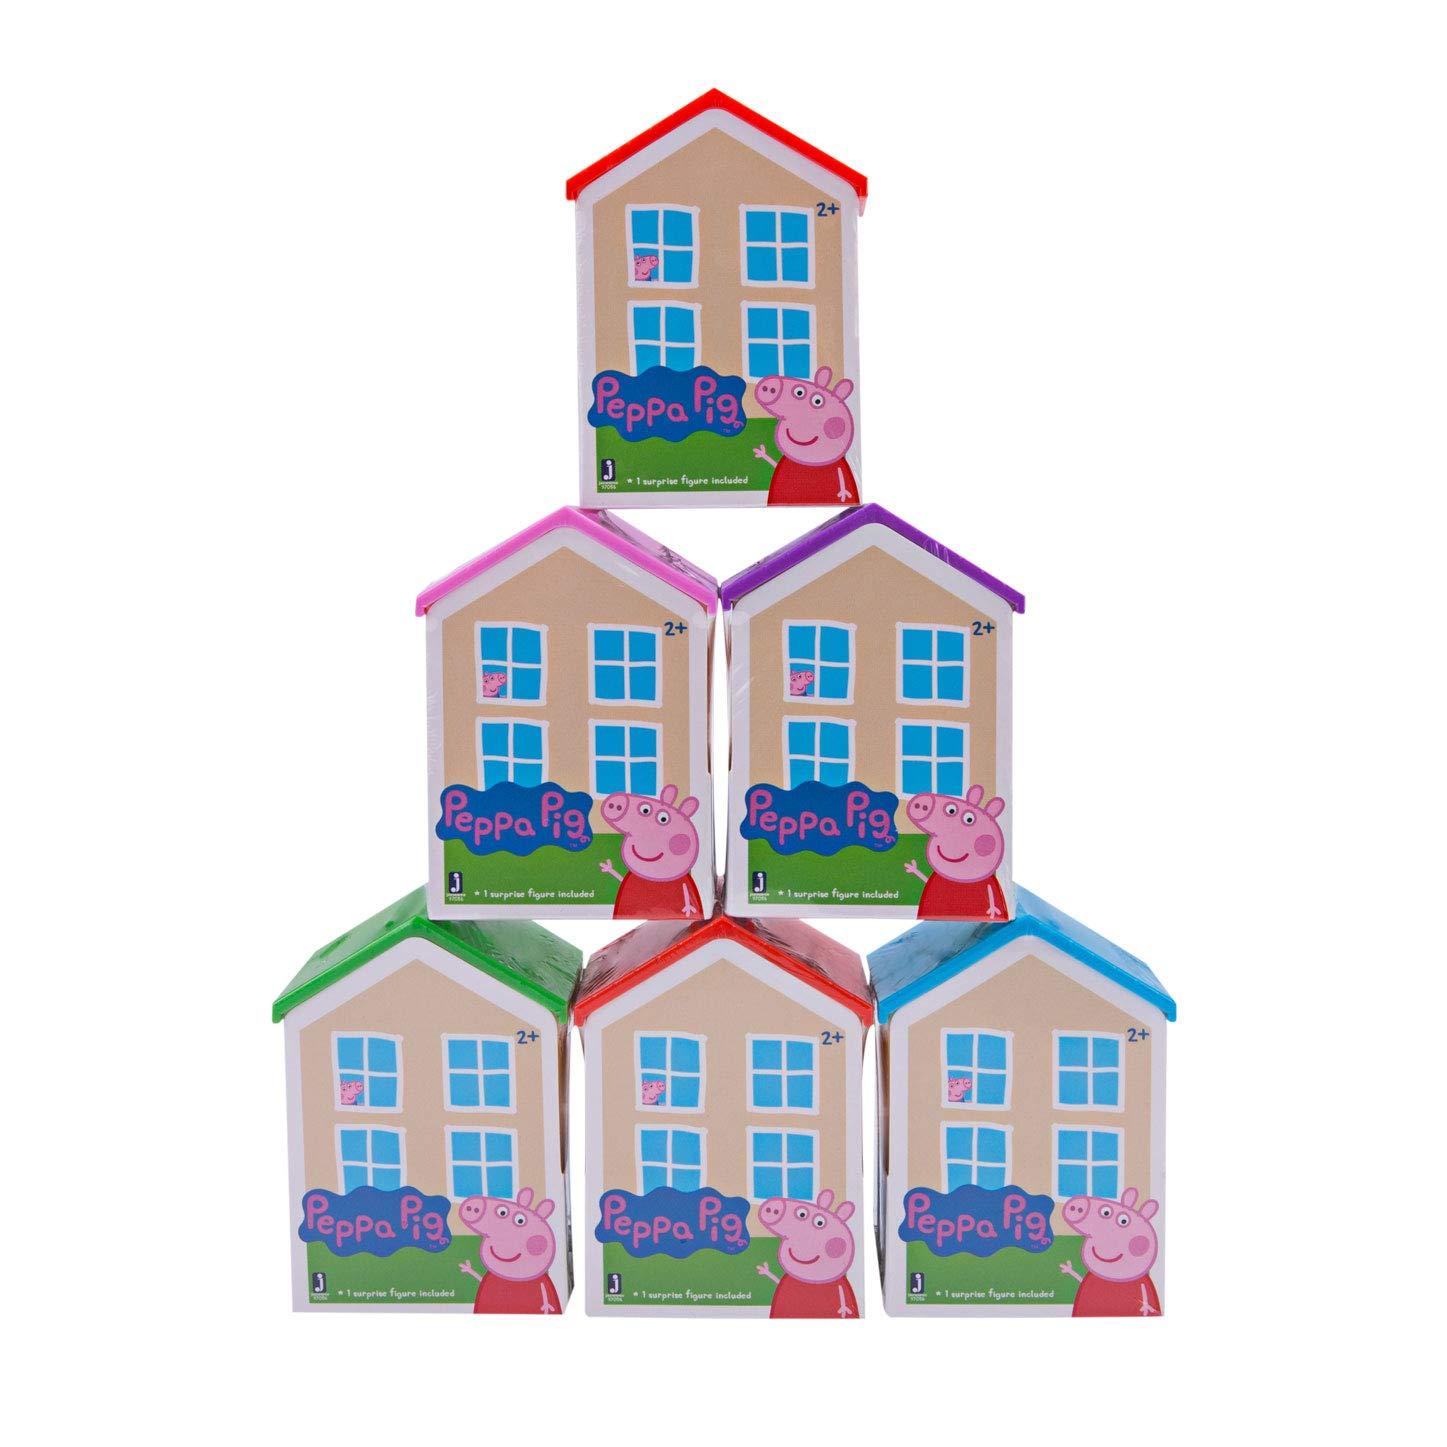 Amazon Com Peppa Pig Blind House Assortment Polybag Of 6 Series 1